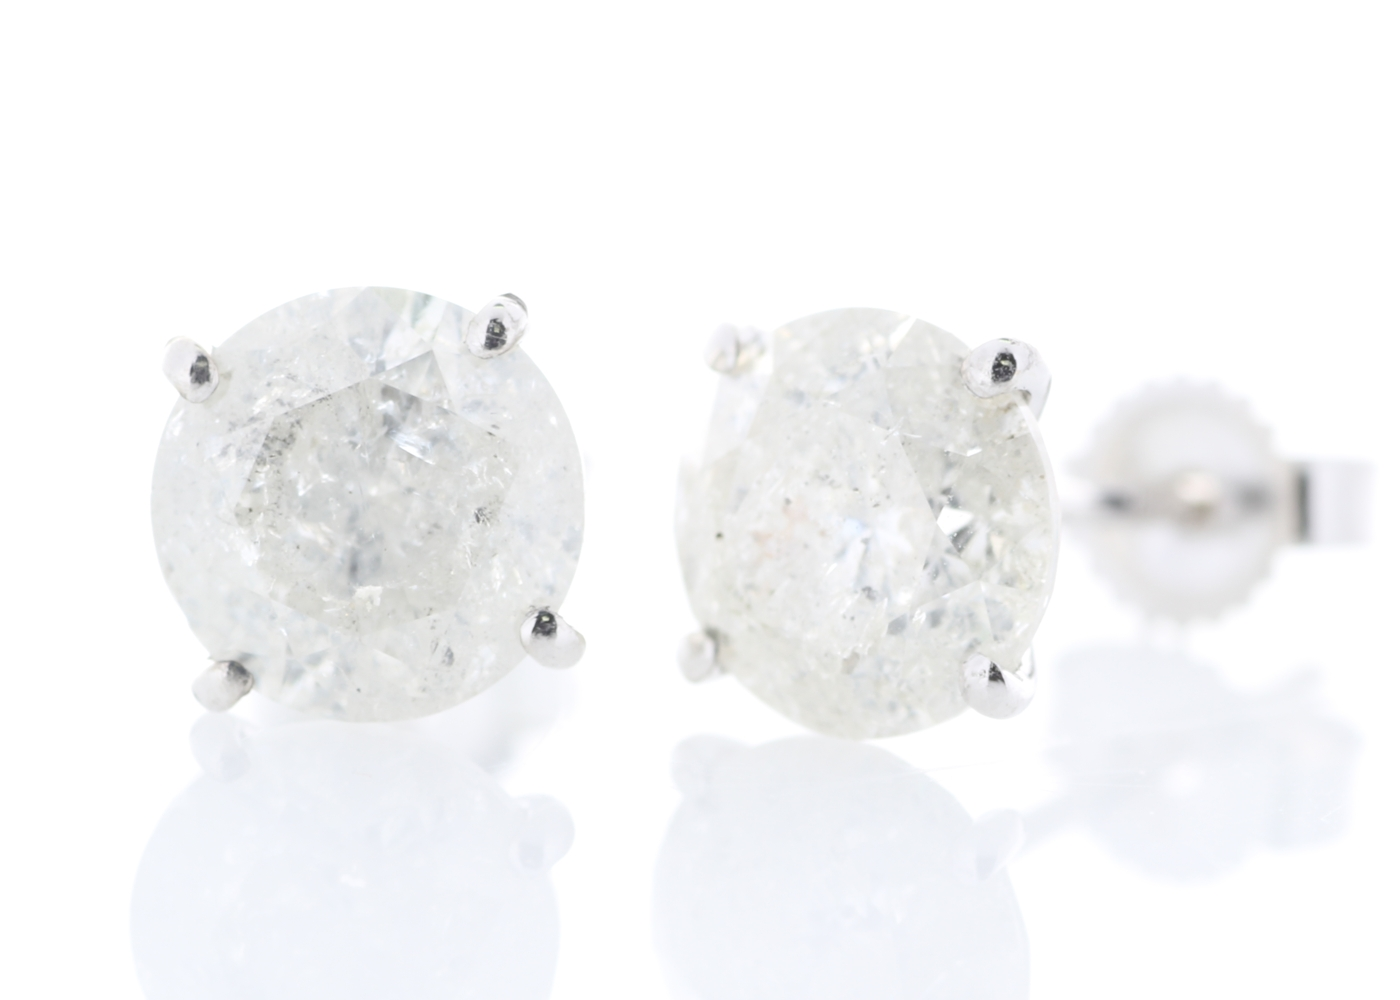 Lot 39 - 18ct White Gold Prong Set Diamond Earrings 2.74 Carats